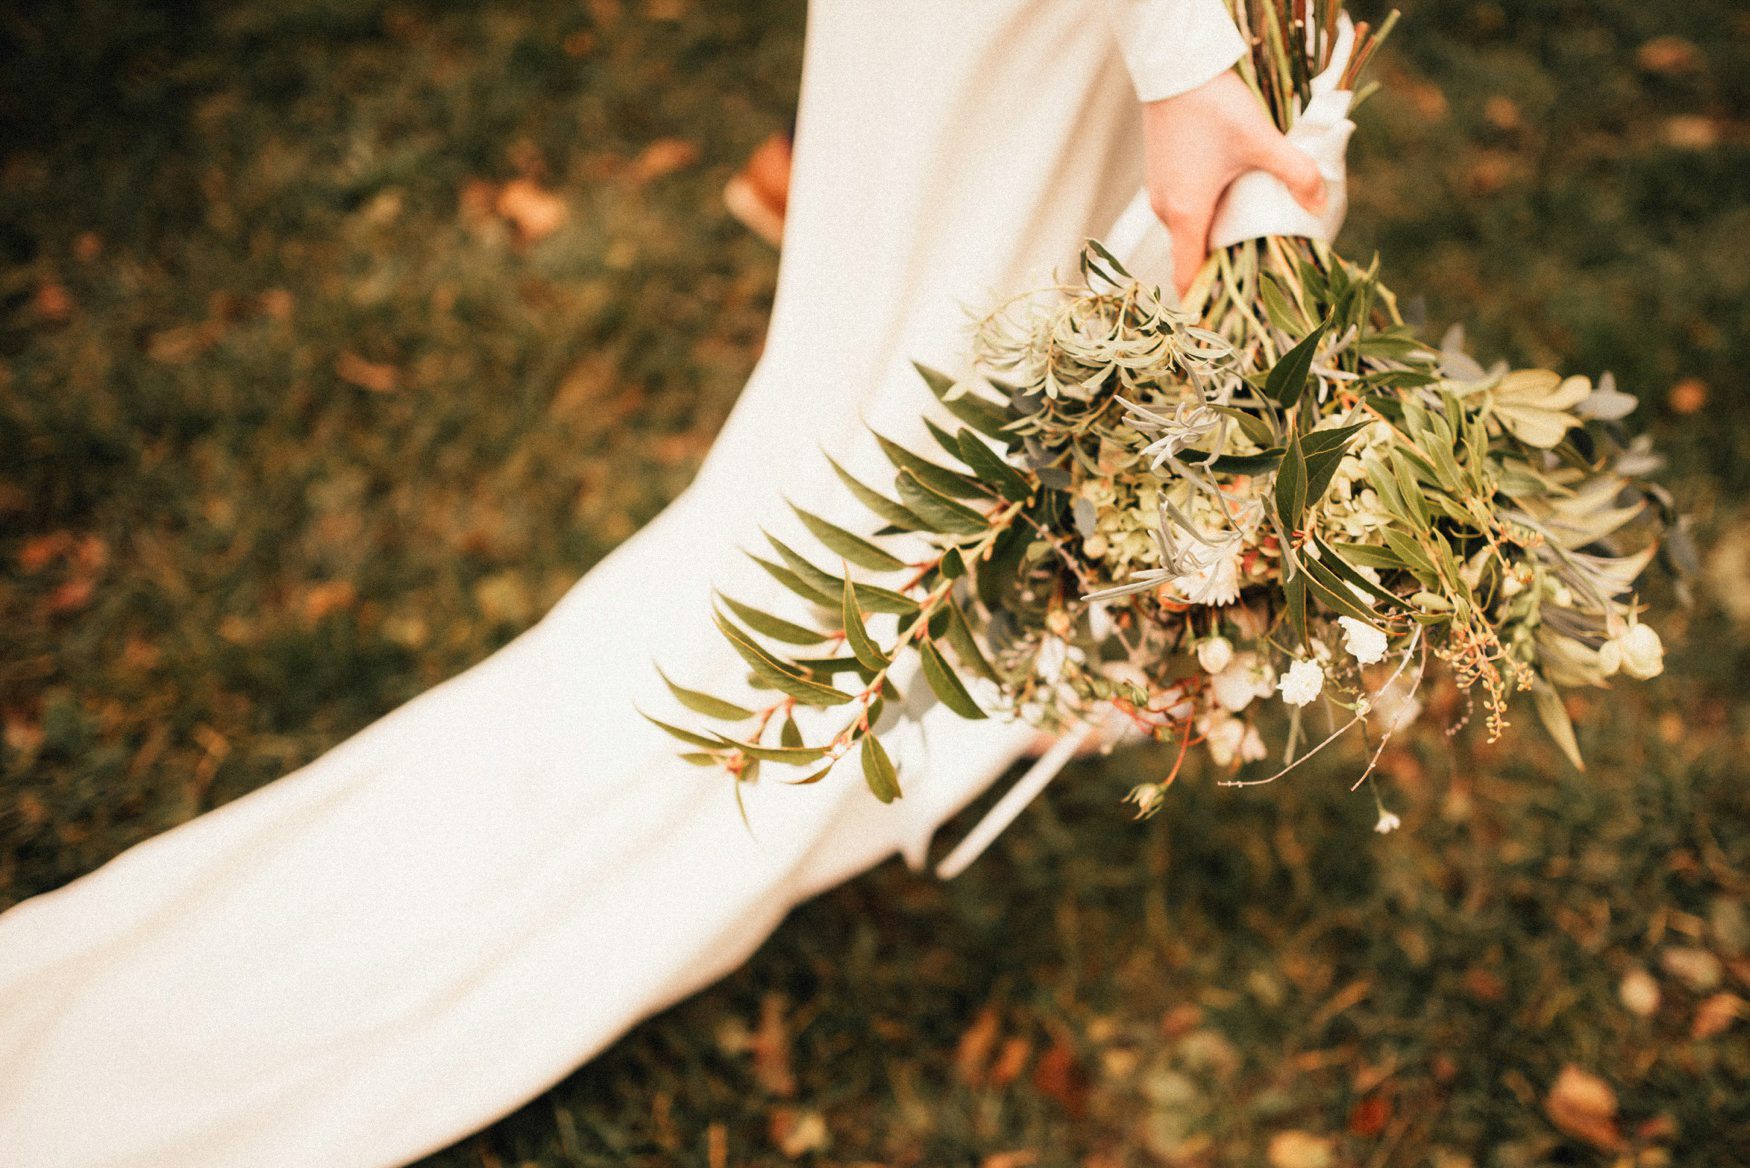 3 czech countryside rustic wedding - svatba zikmundov007.jpg